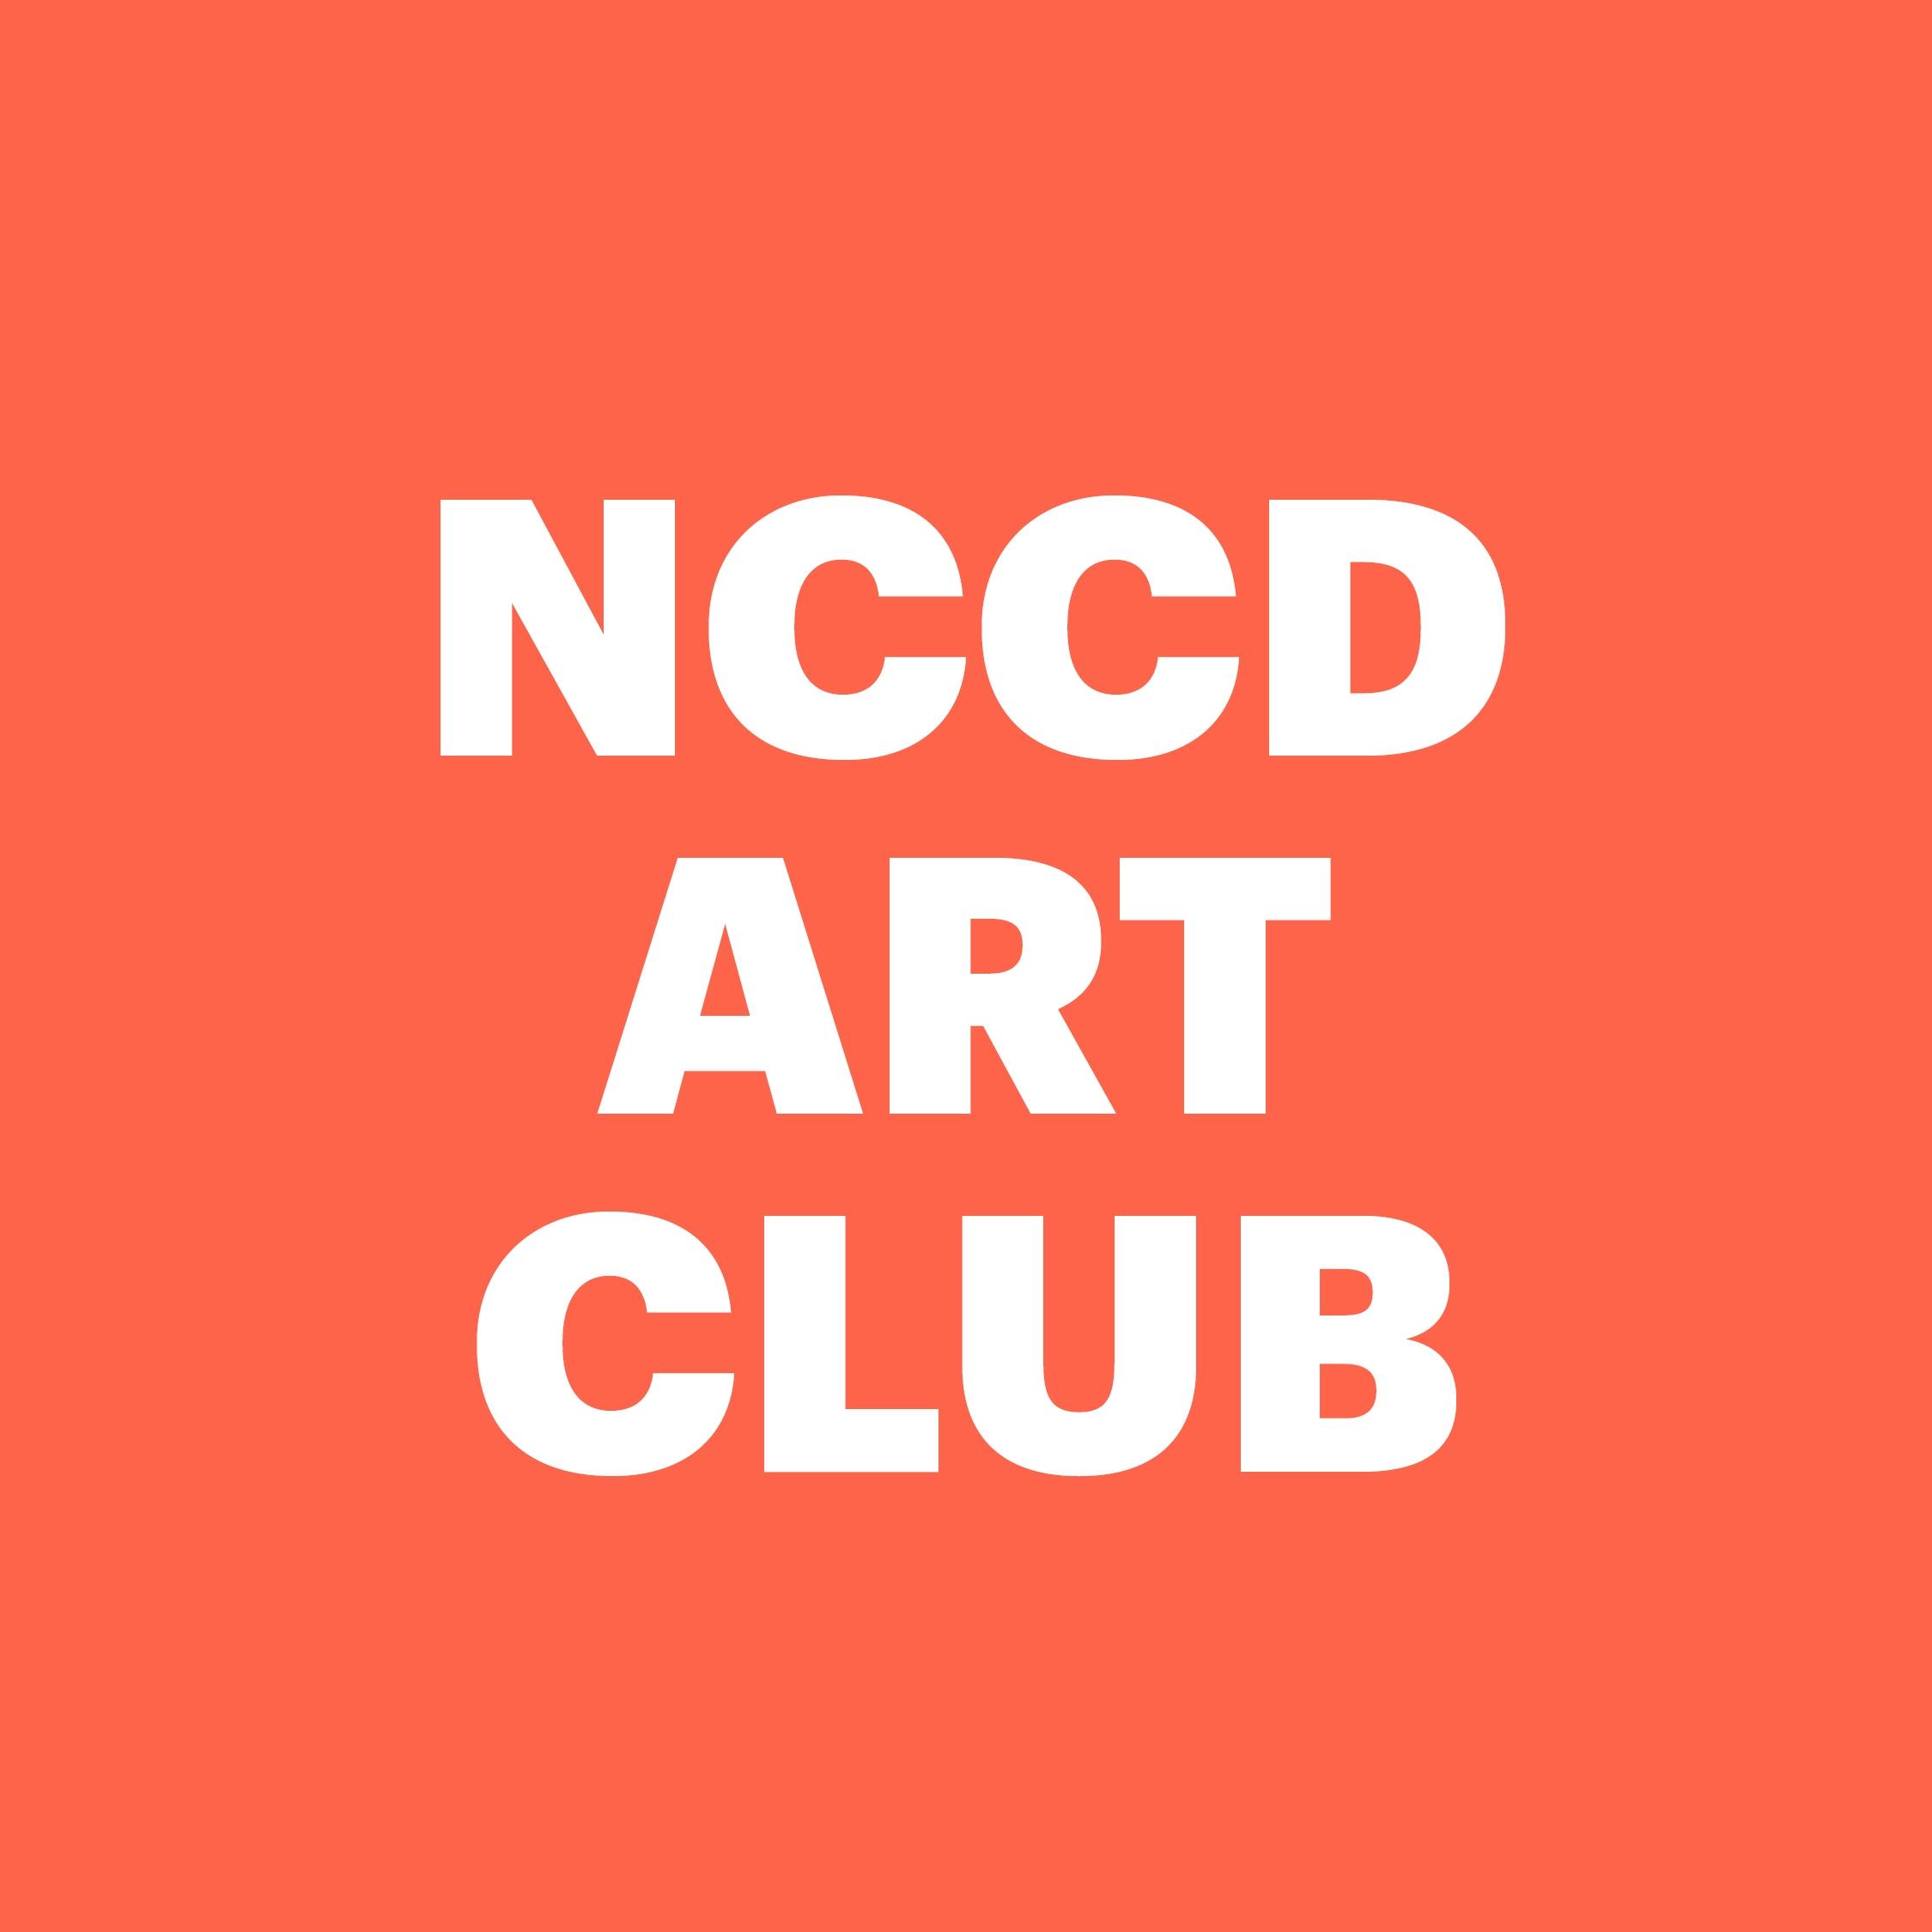 NCCD Art Club